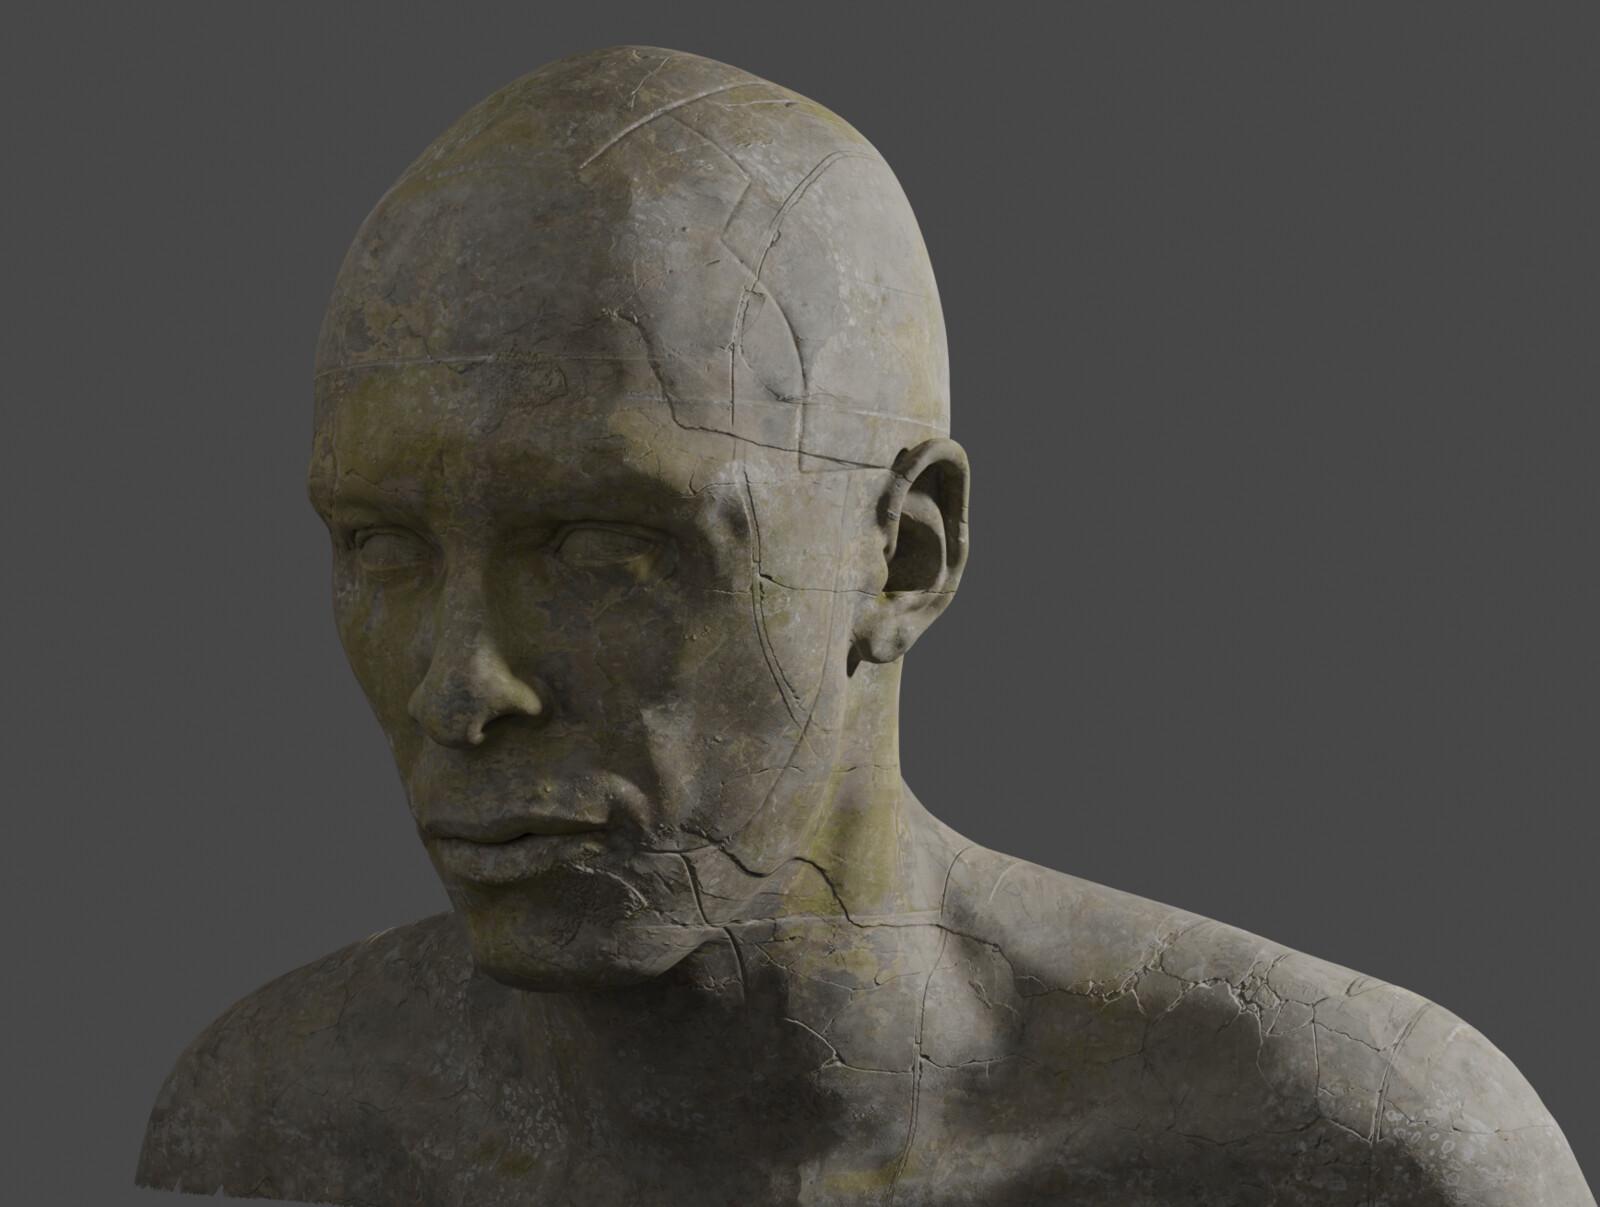 Quick renders of the final look